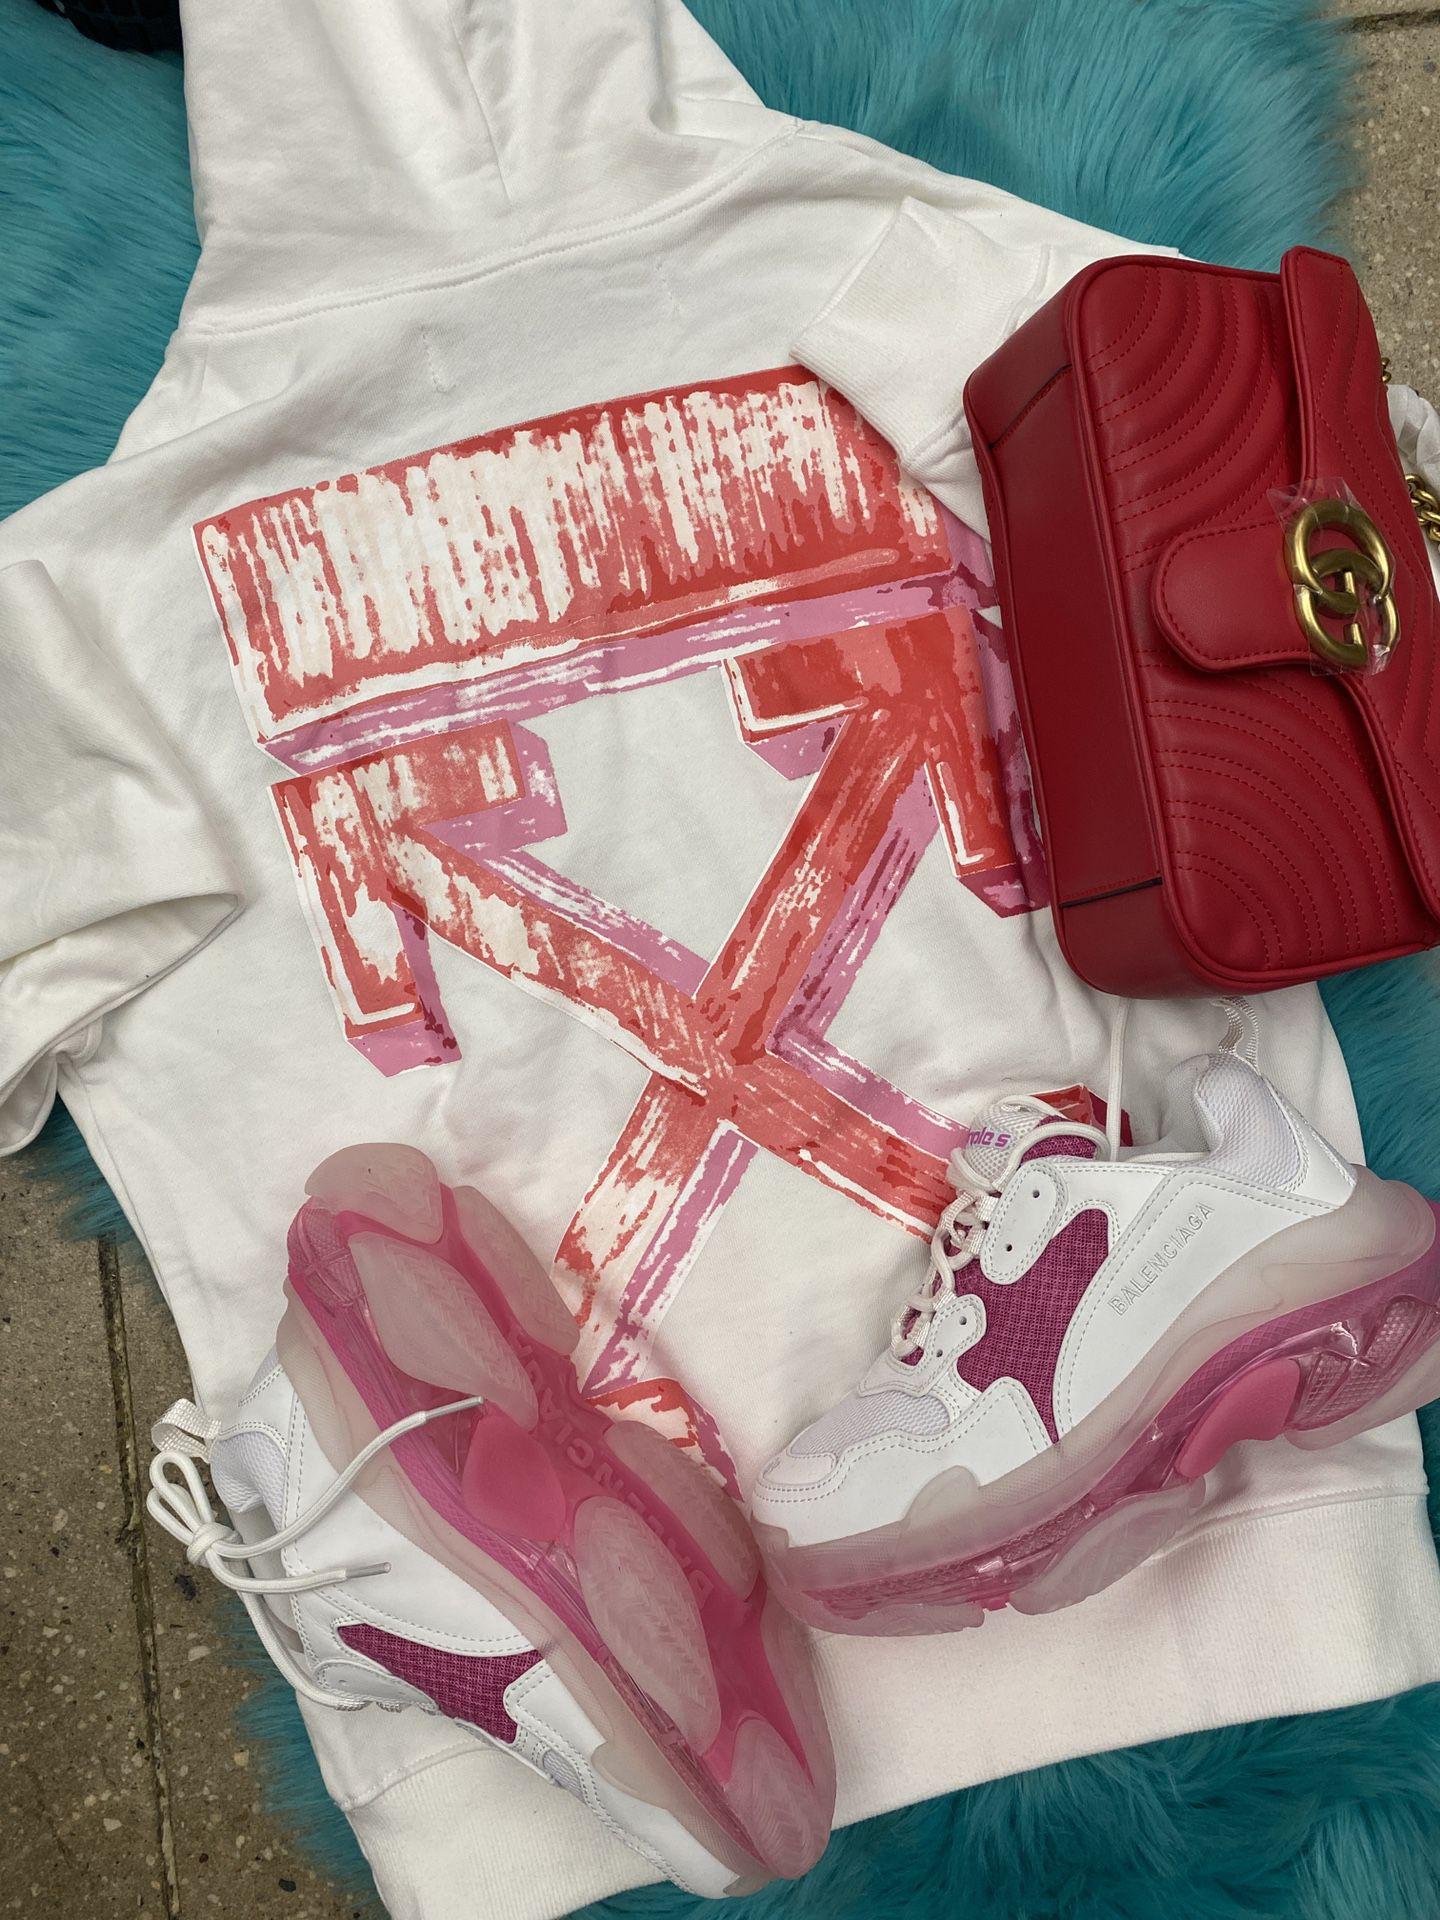 Offwhite Hoodie. Balenciaga Sneakers Gucci Bag